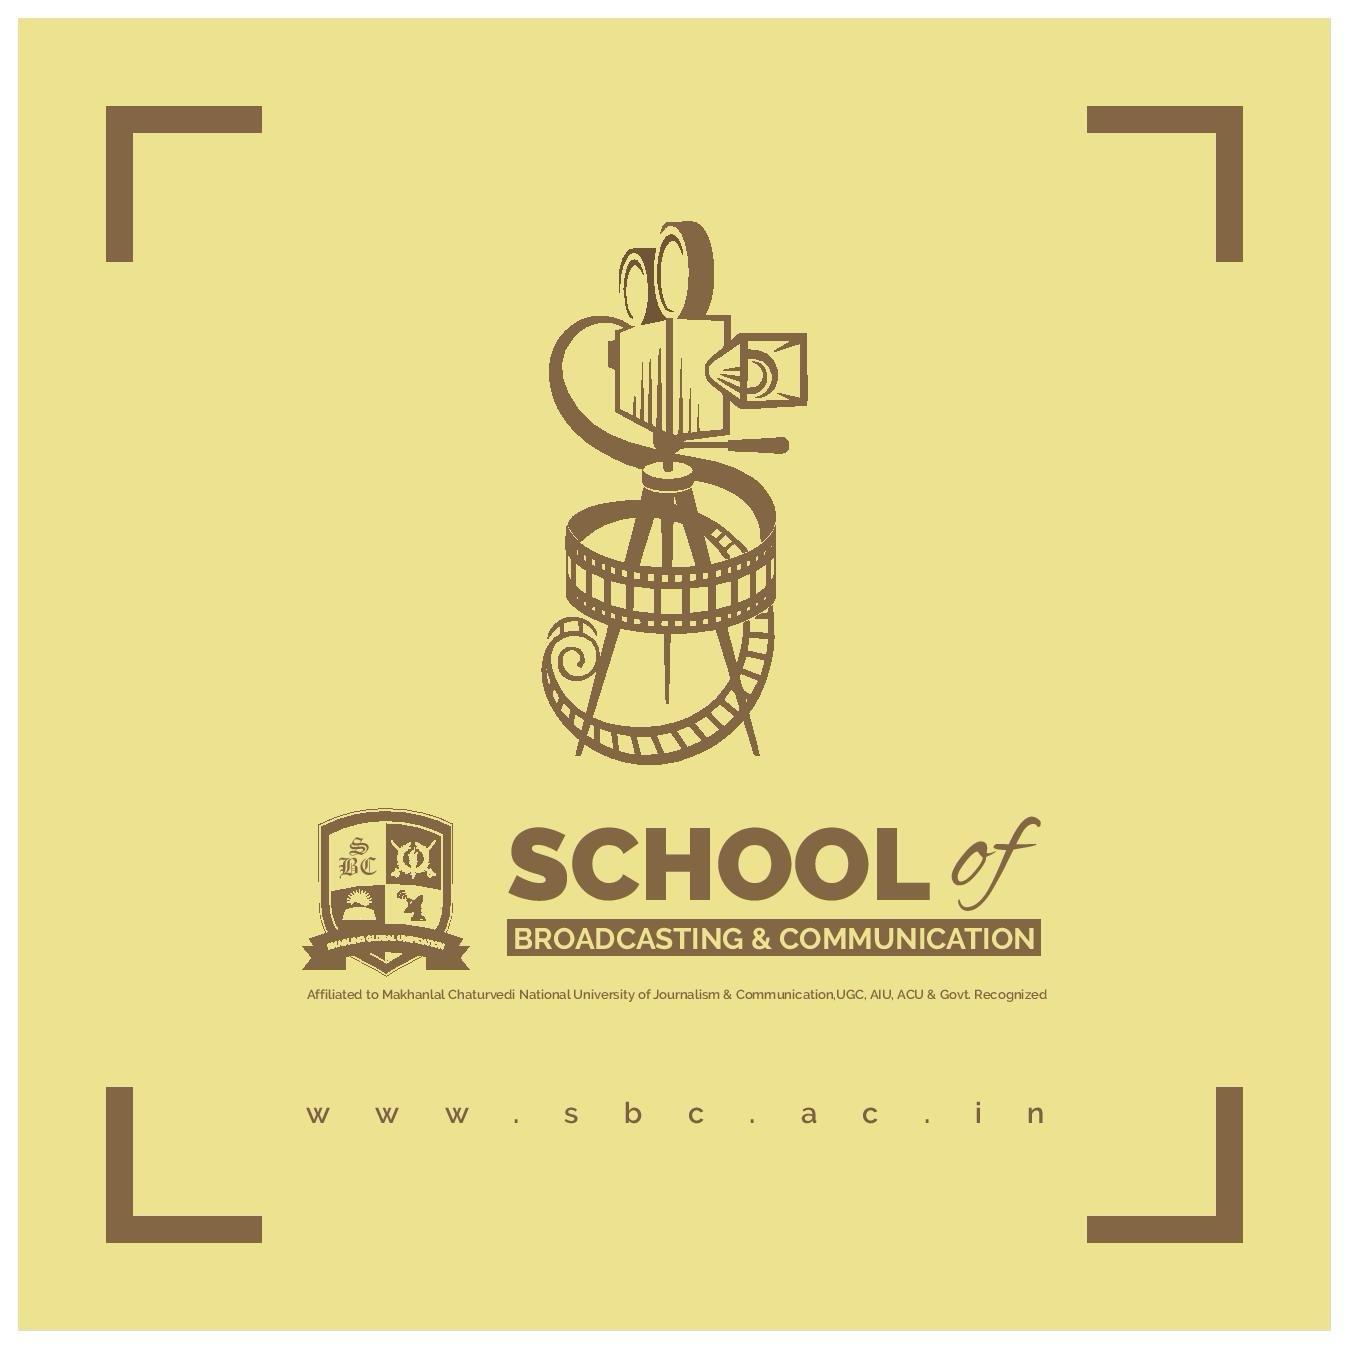 School Of Broadcasting & Communication